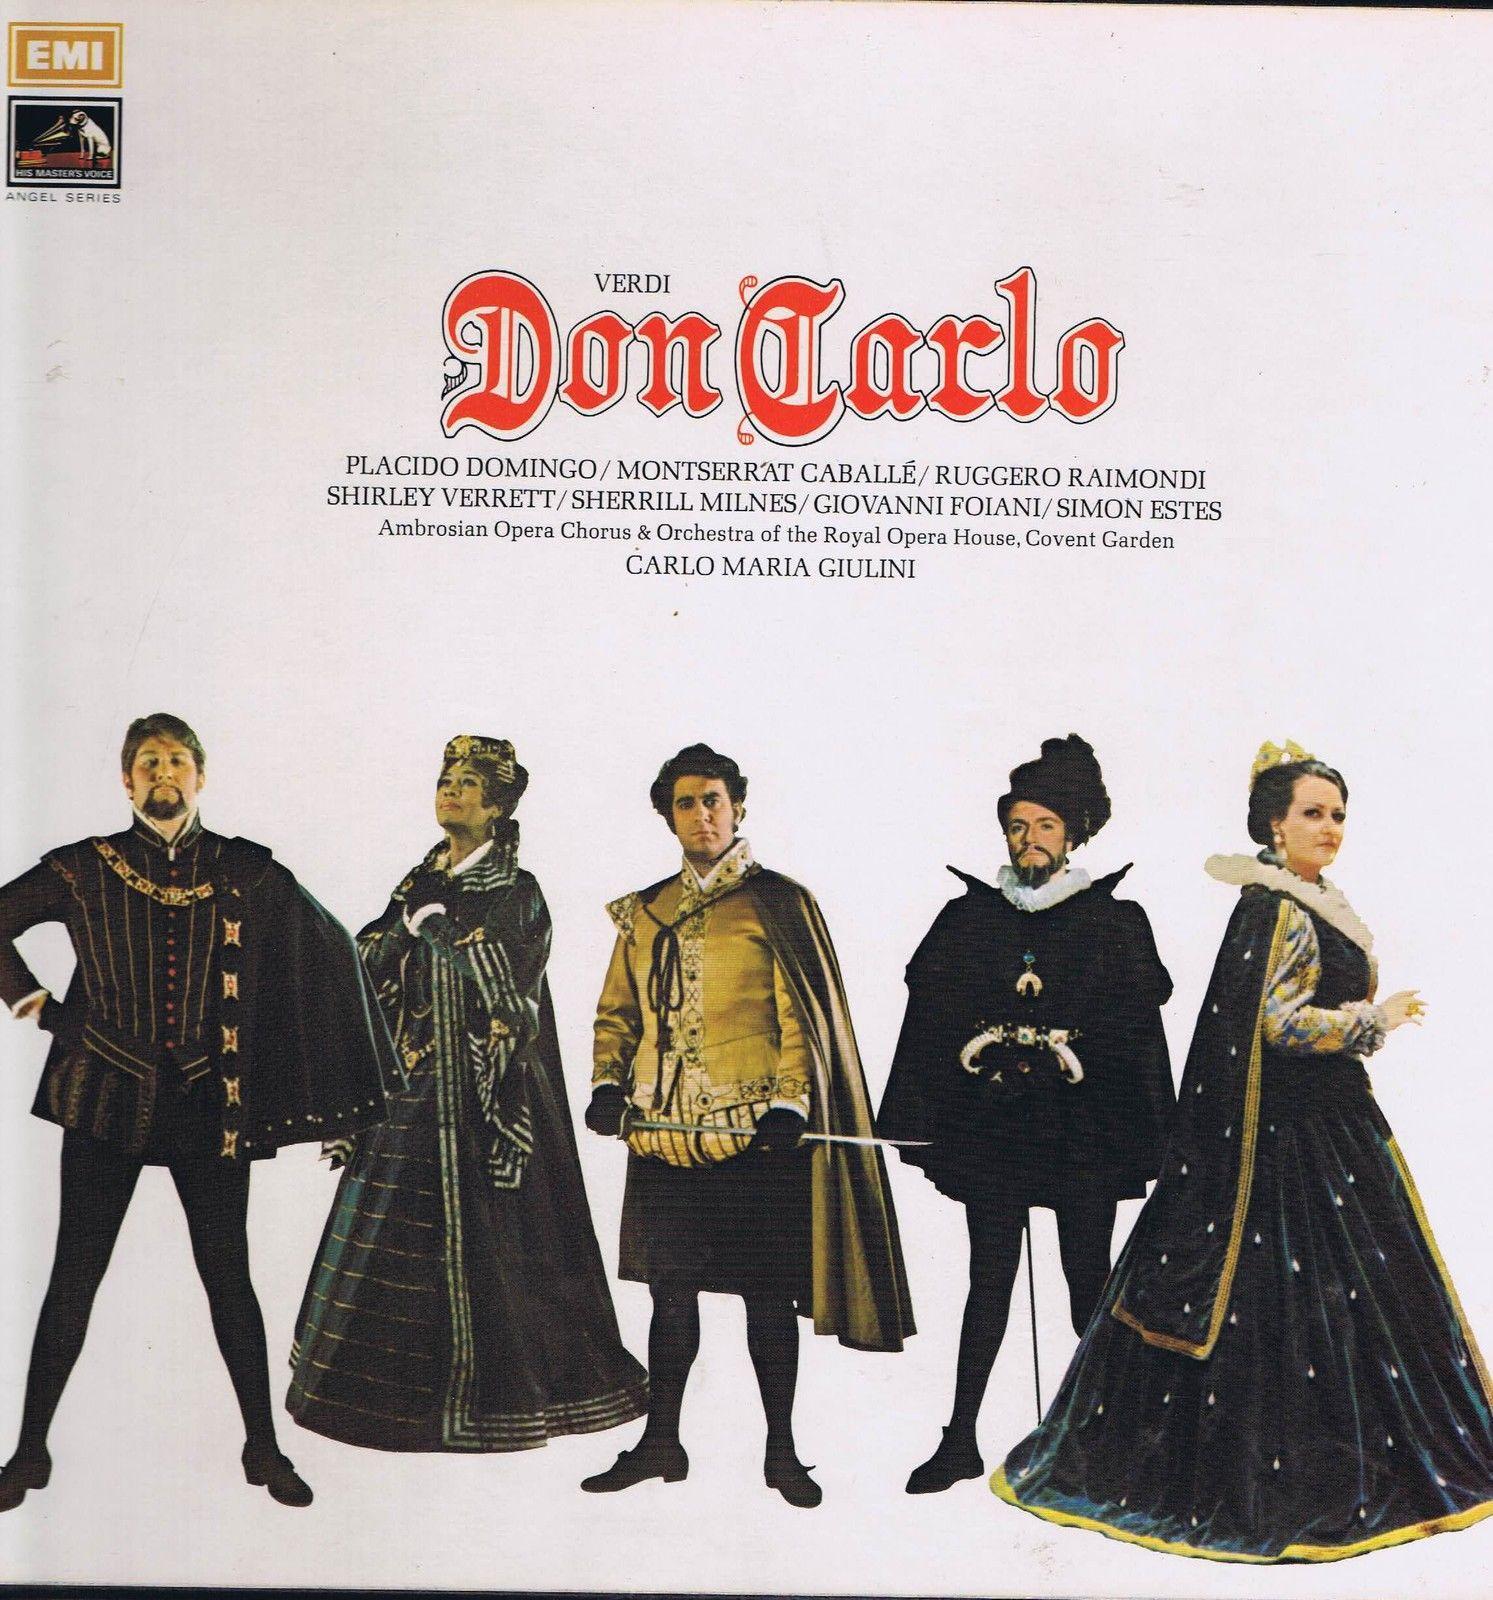 verdi-don-carlo-giulini-domingo-caballe-sls-956-emi-4-lp-vinyl-re-281317552411